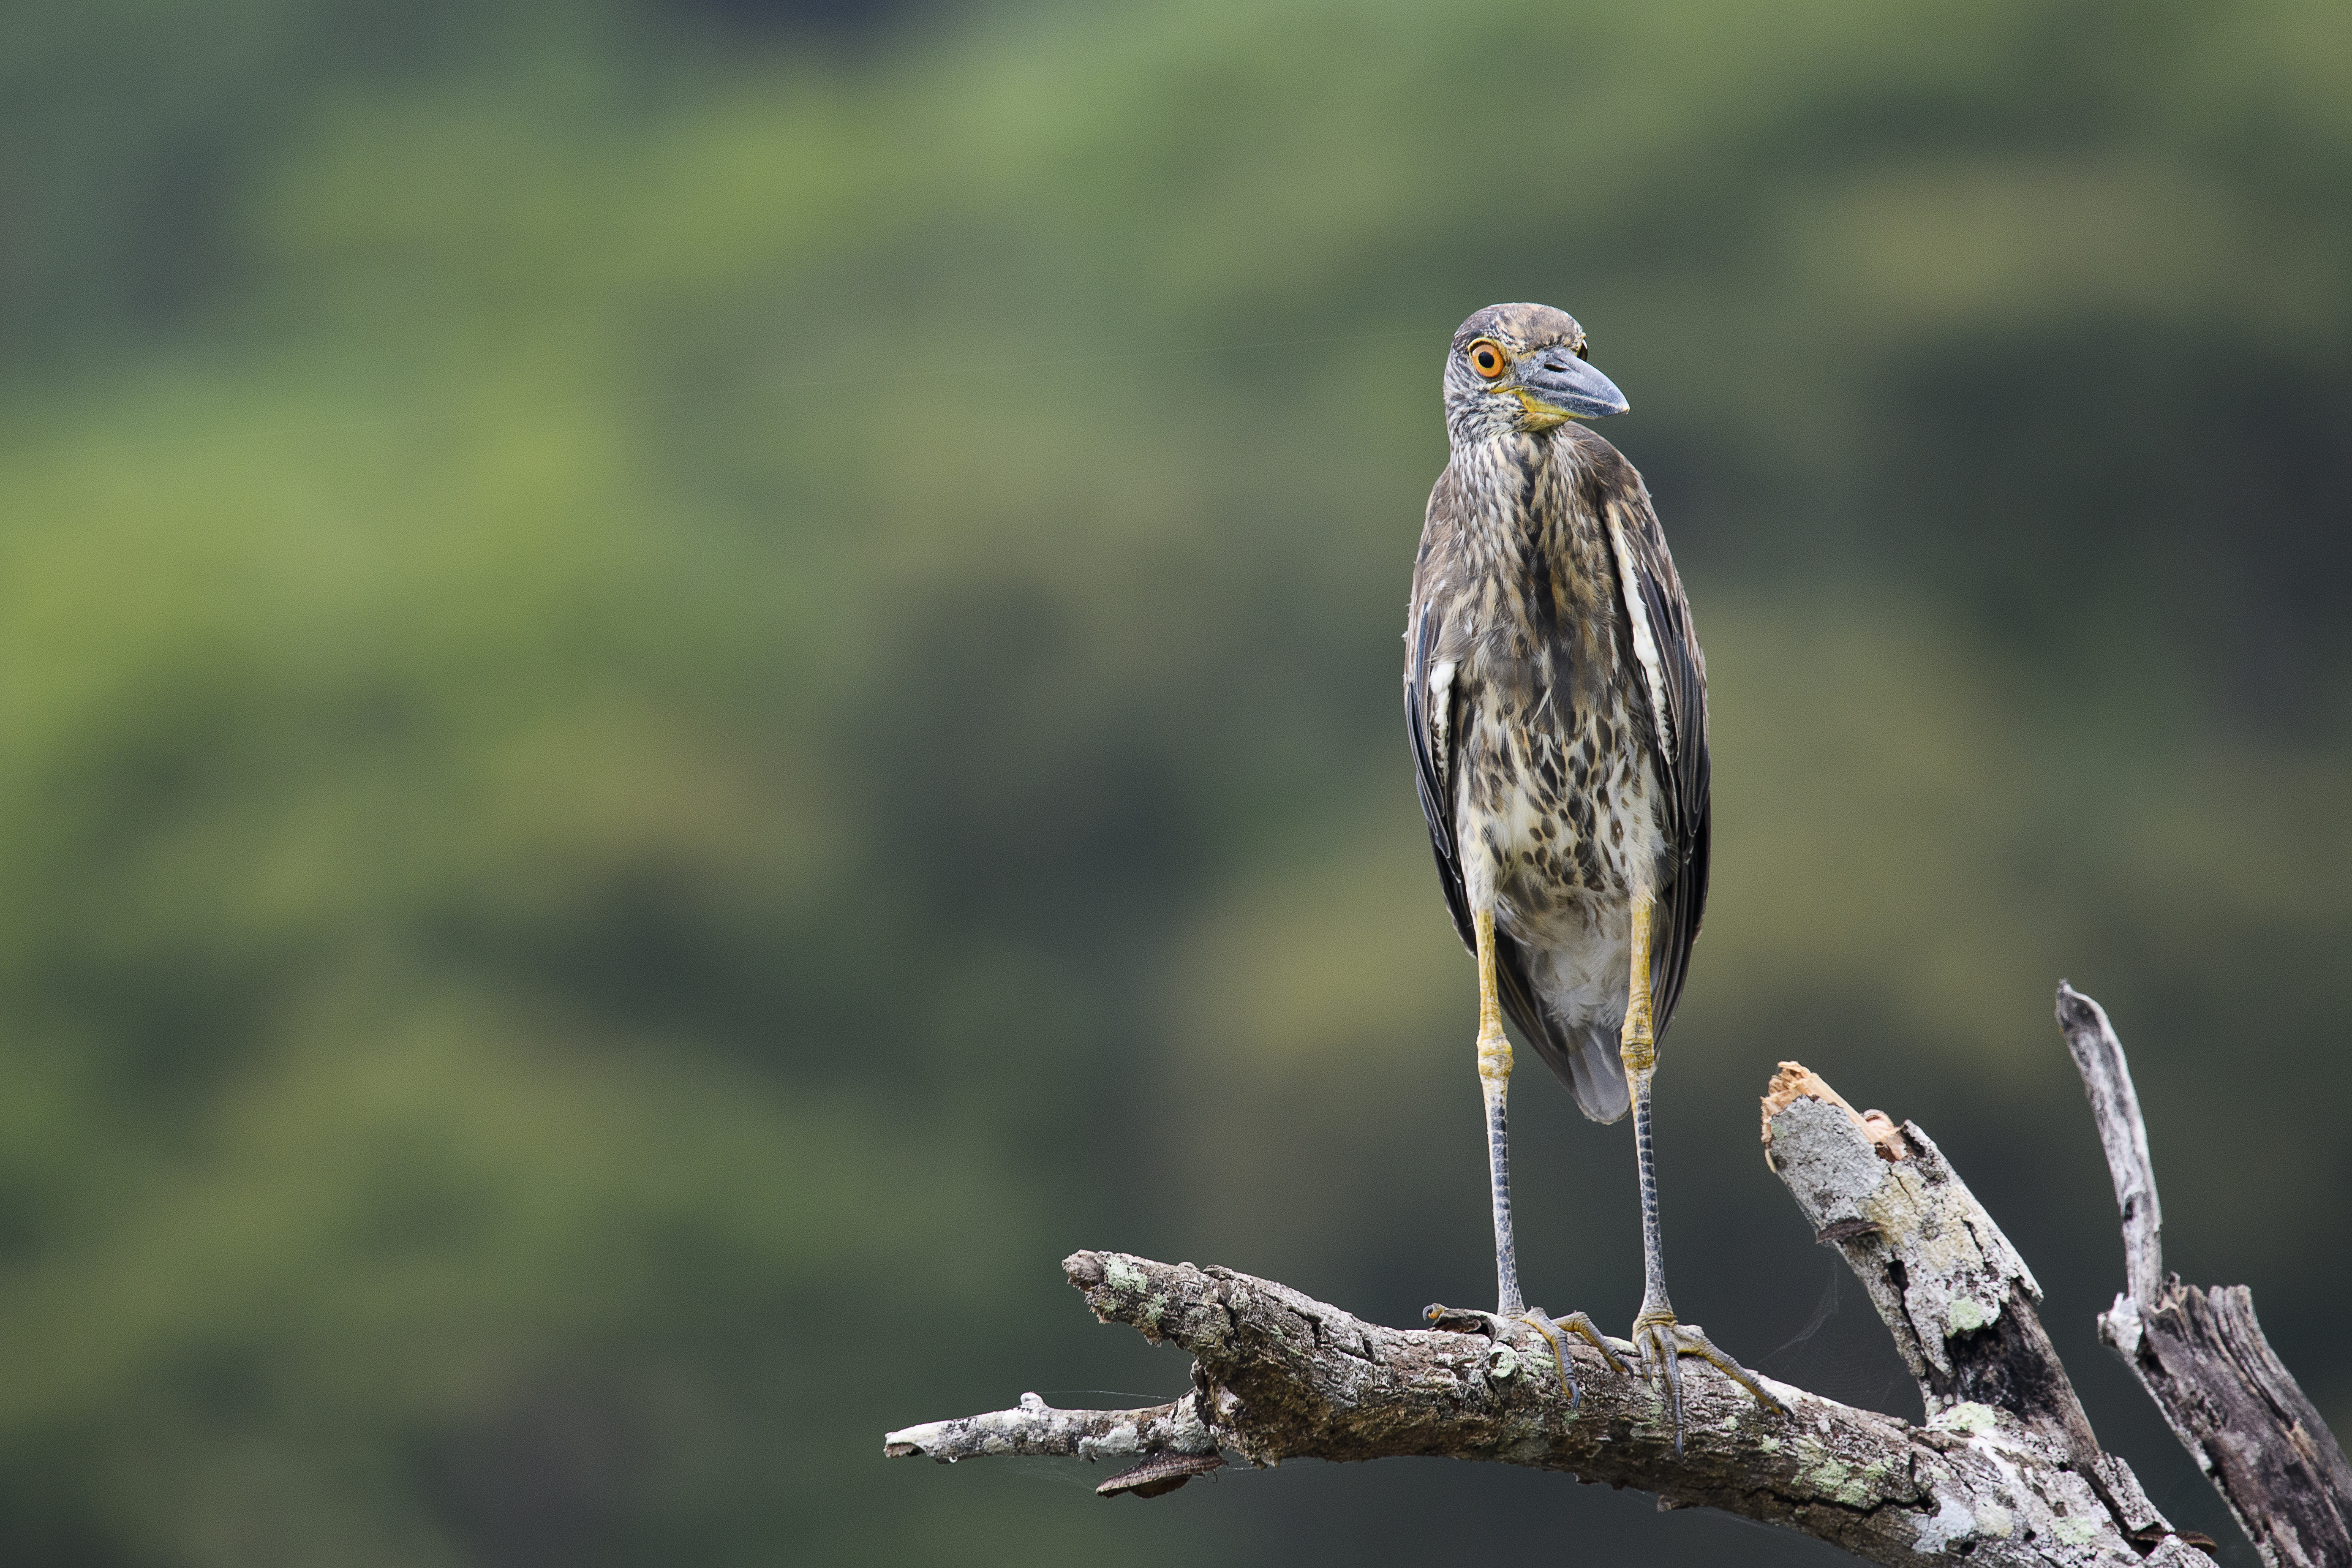 juv yellow crowned night heron front